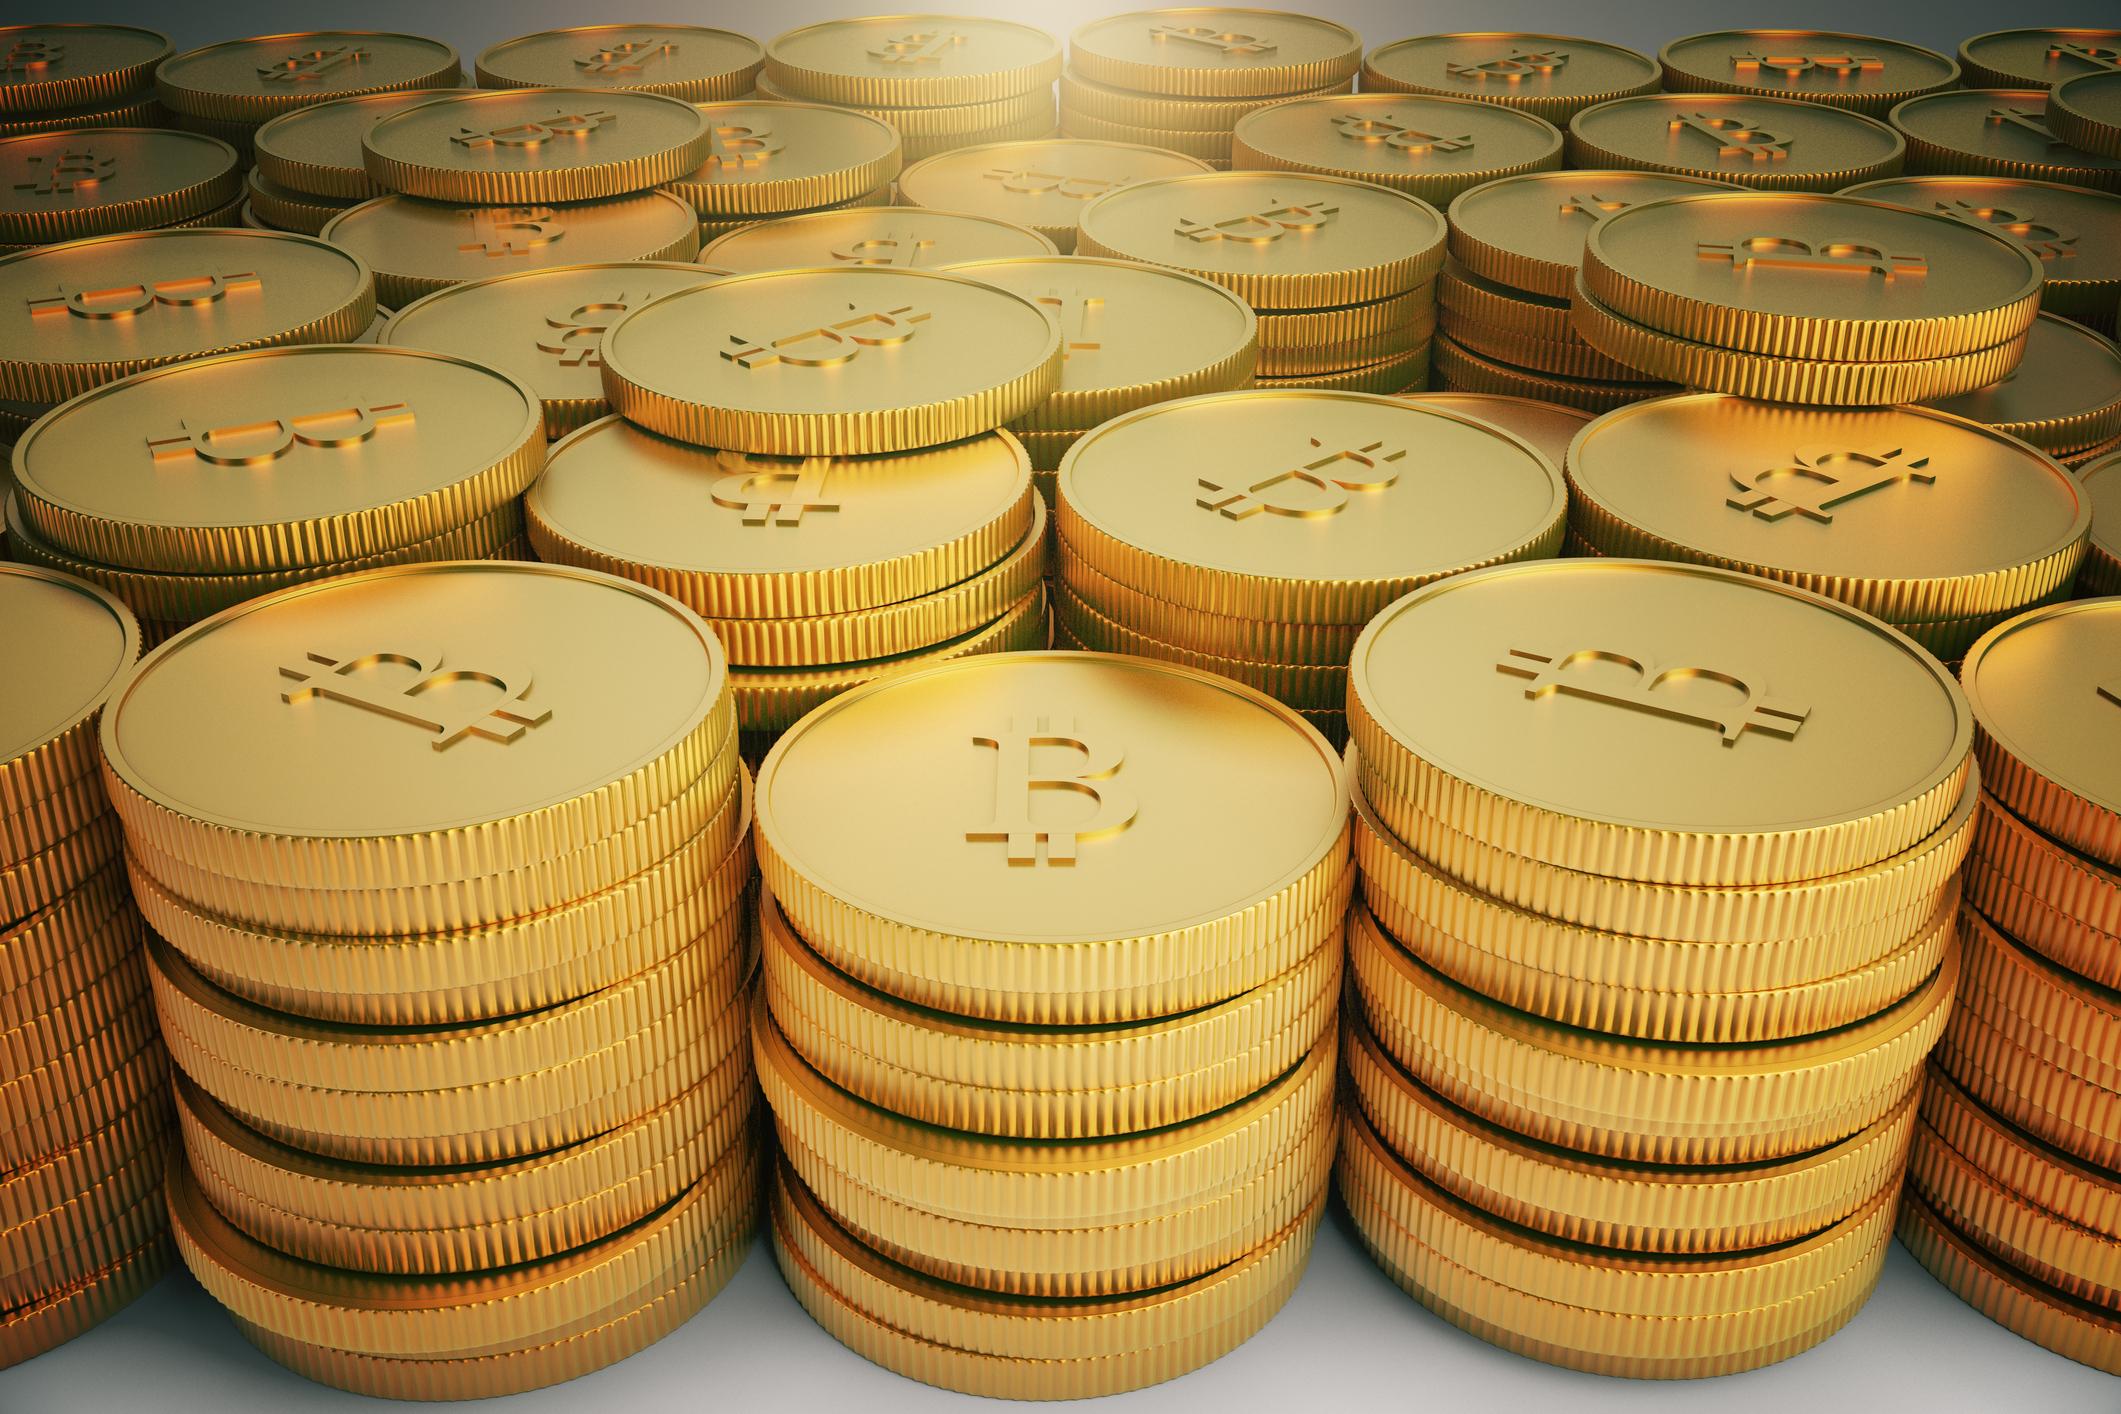 Stacks of gold coins bearing the bitcoin symbol.